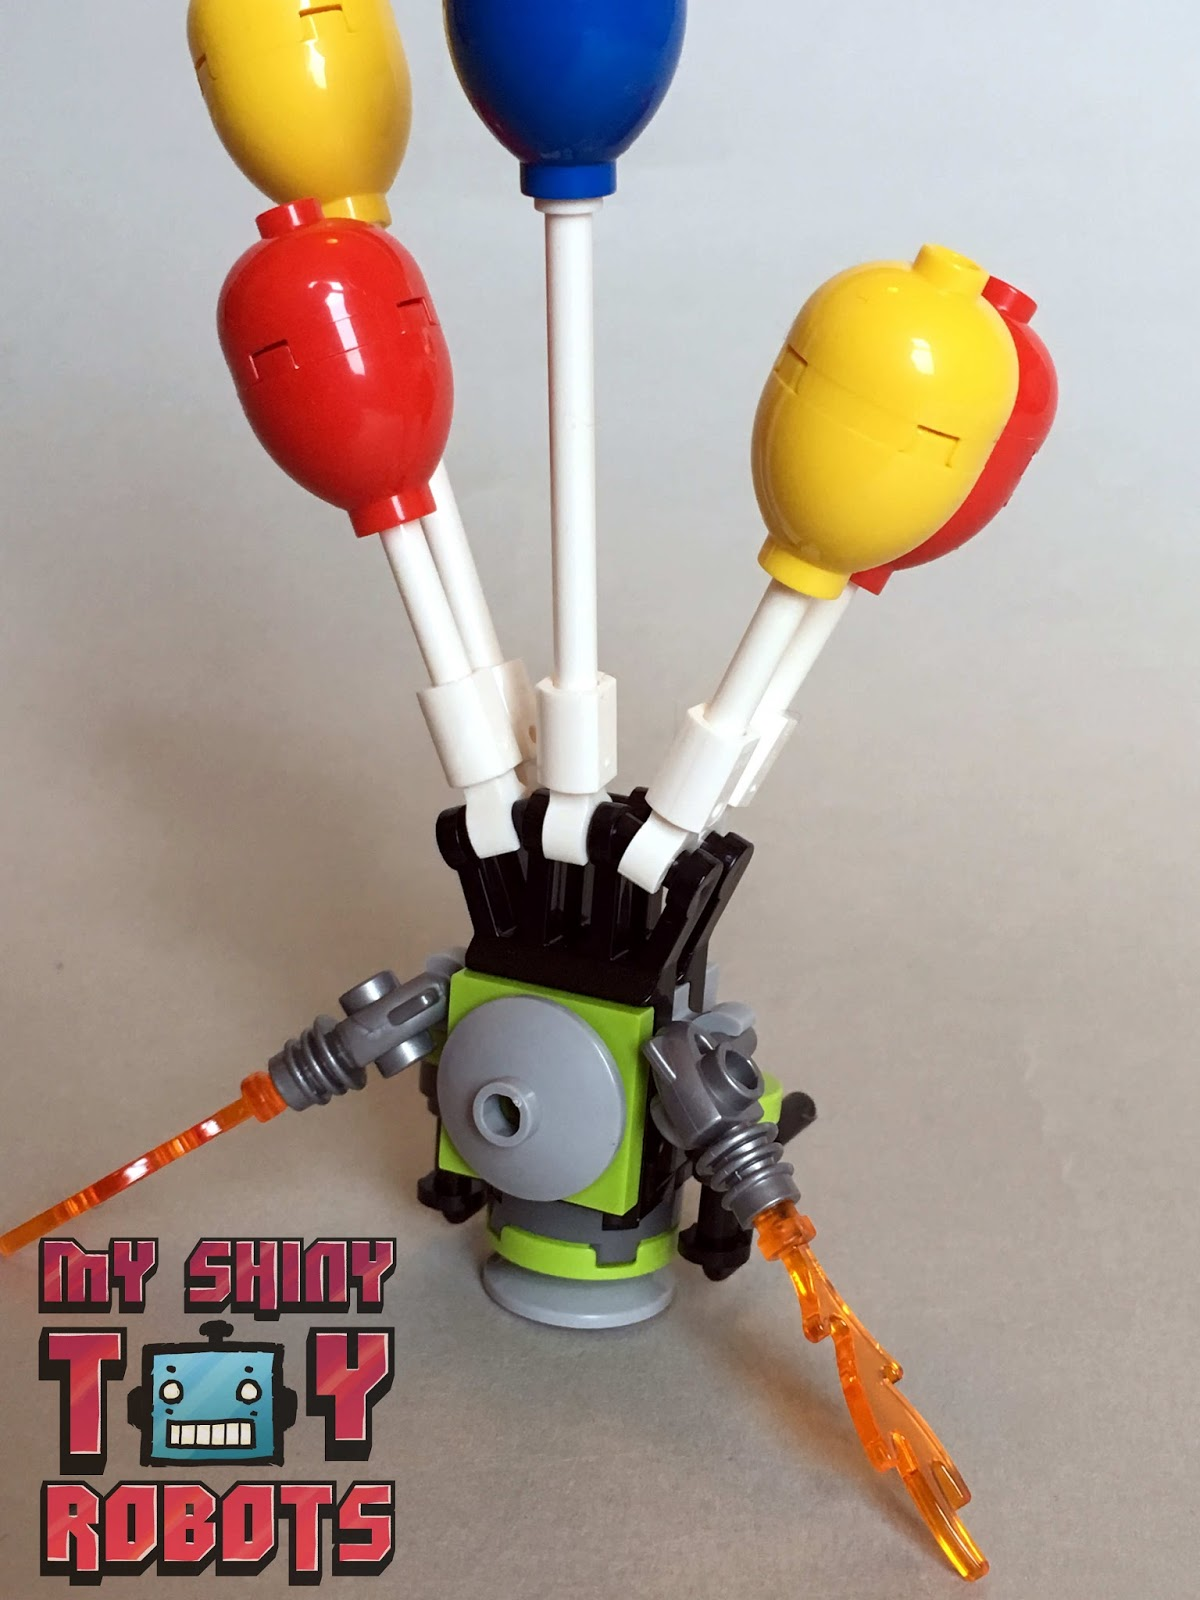 a882309e49f3 My Shiny Toy Robots  Toybox REVIEW  The LEGO Batman Movie Set 70900 ...